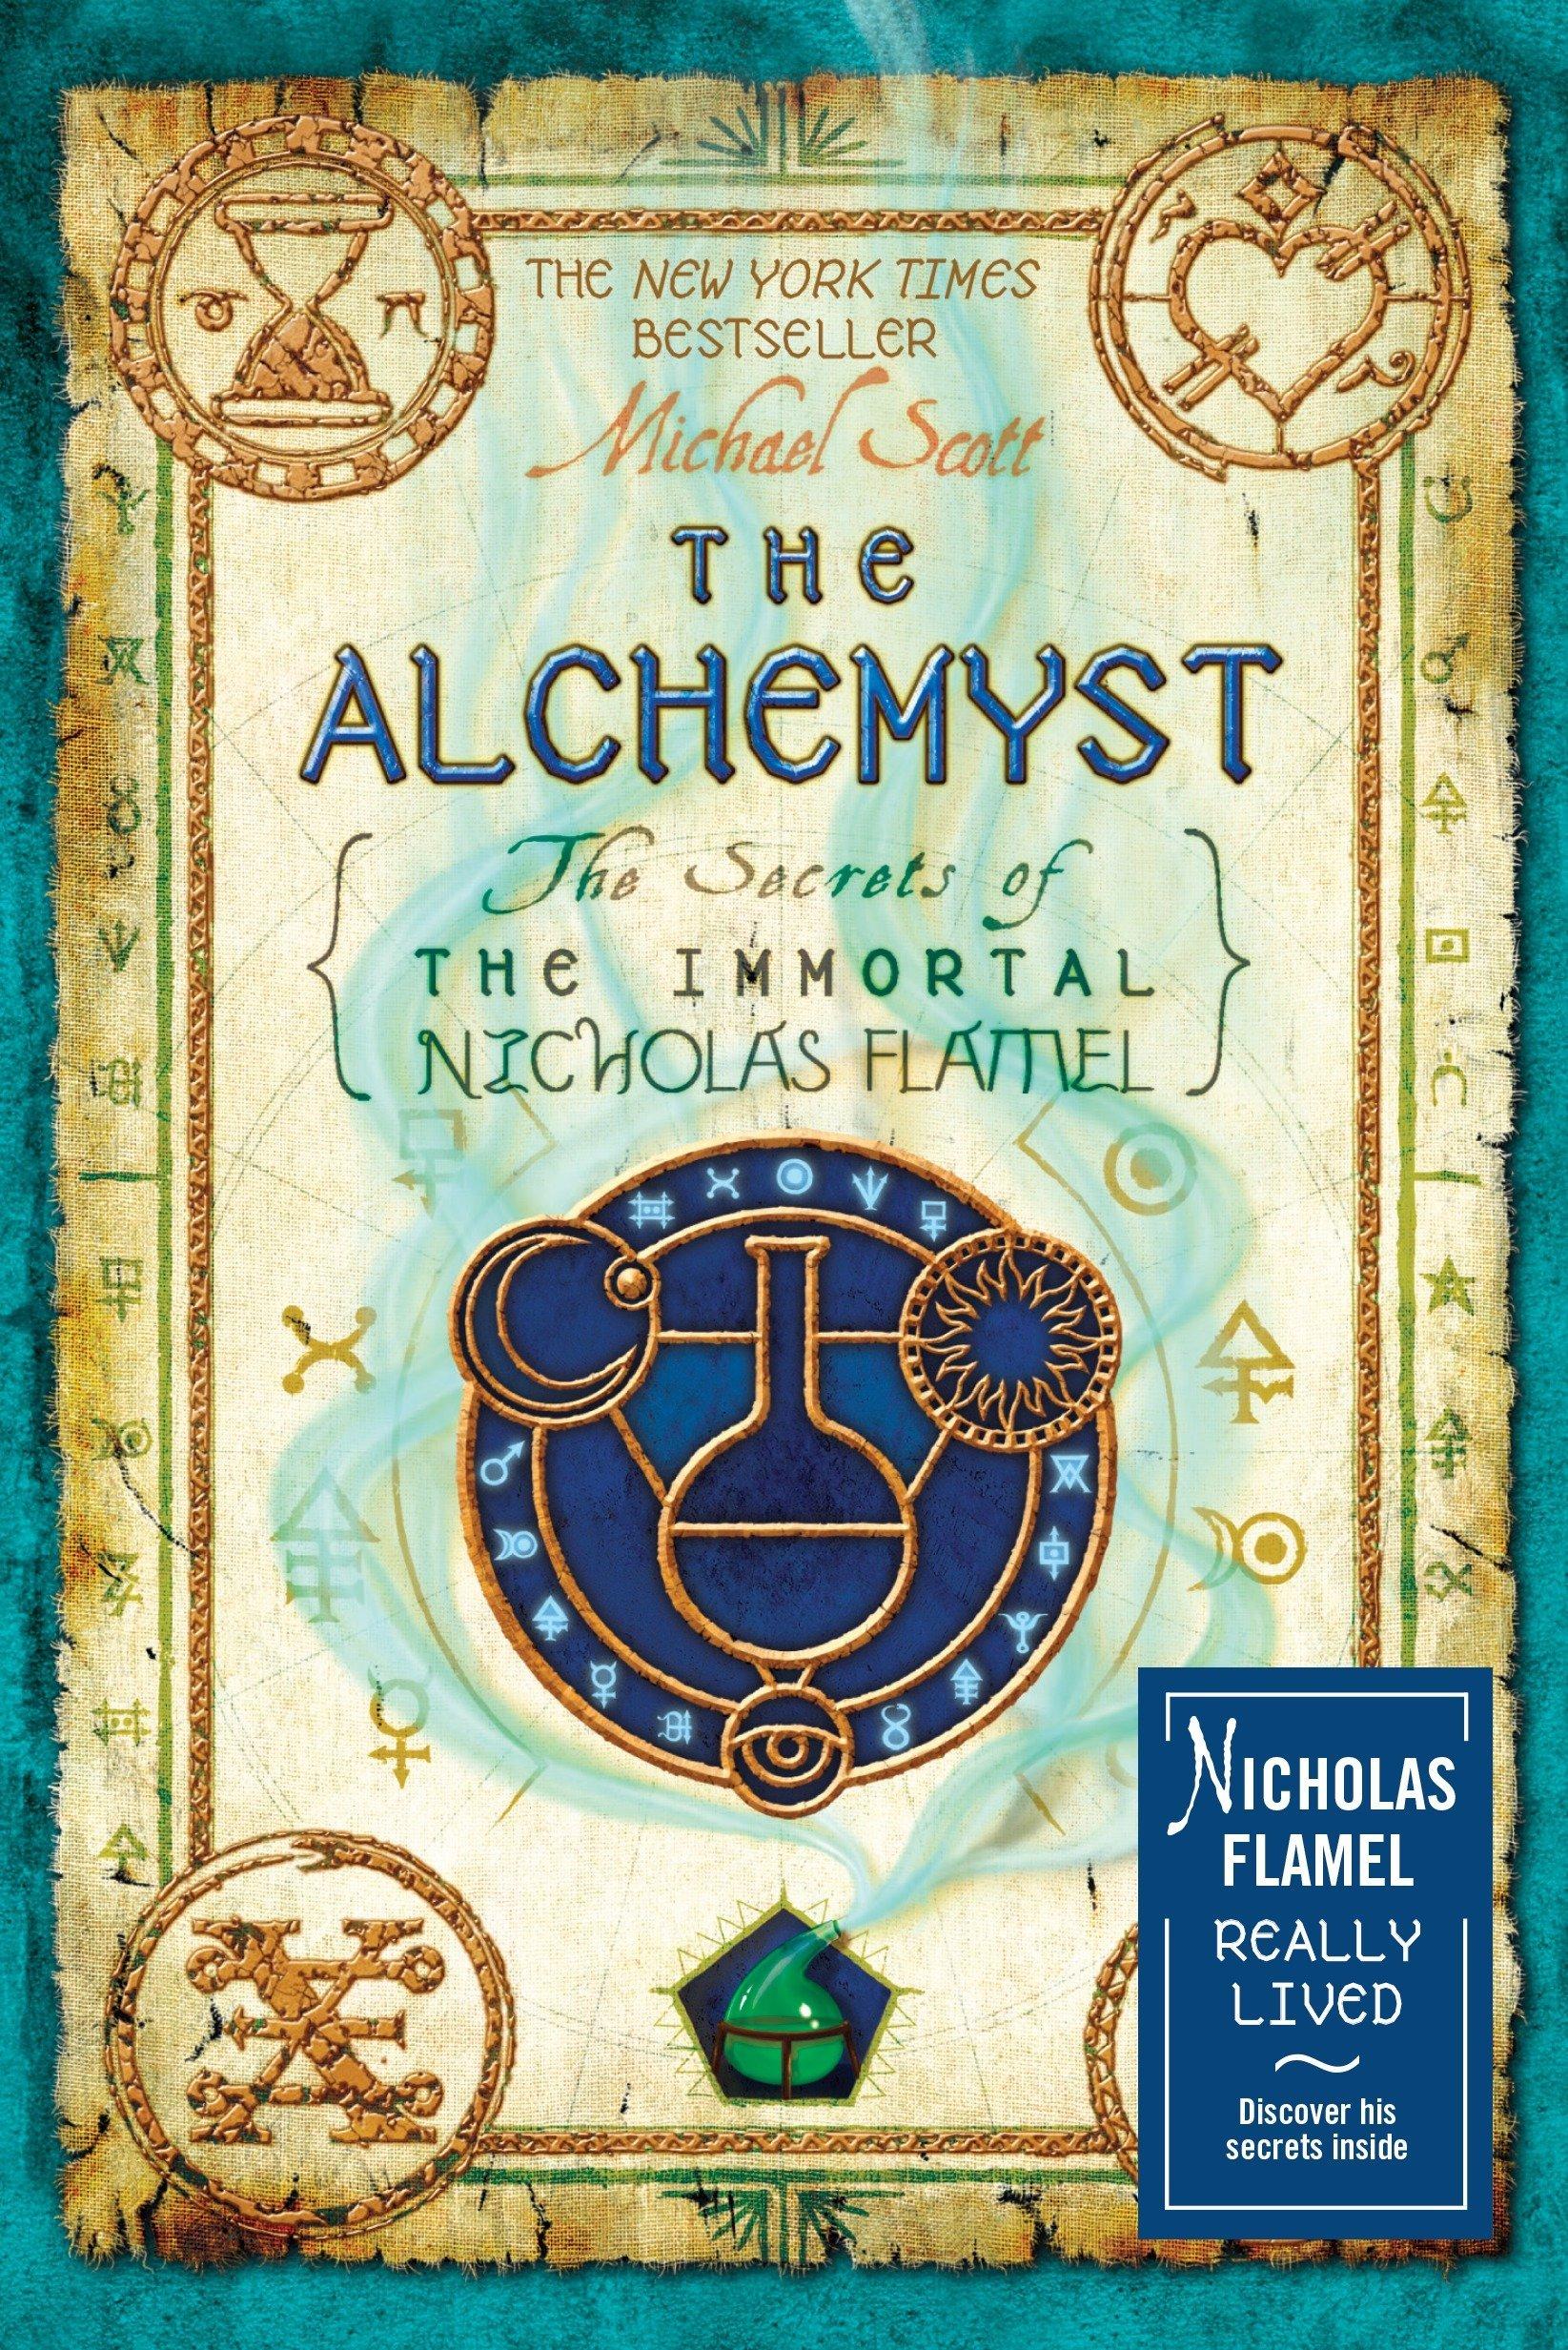 The Alchemyst: The Secrets of the Immortal Nicholas Flamel pdf